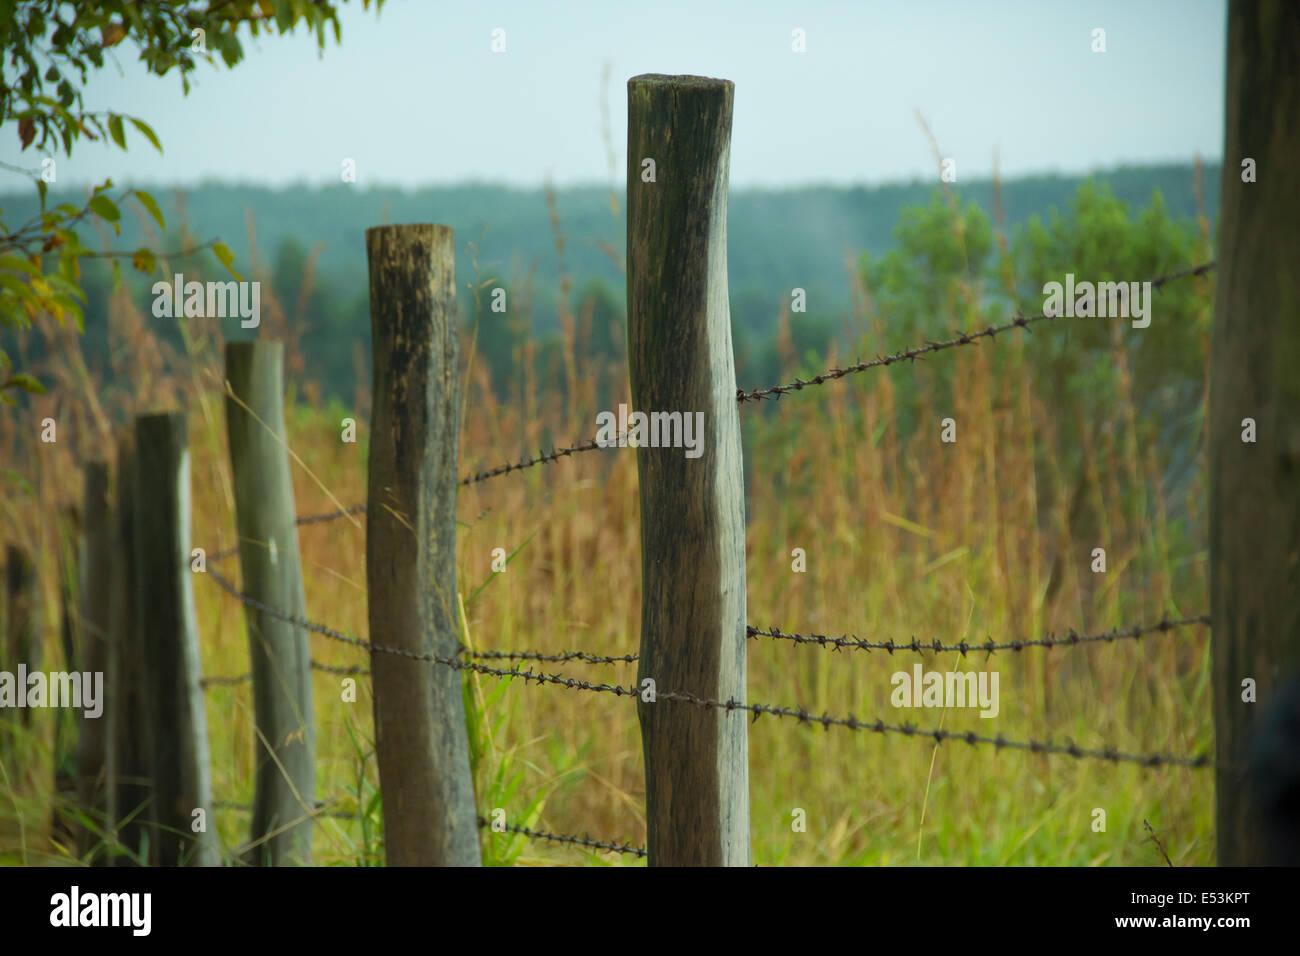 Zaun Aus Holz Und Stacheldraht Stockfoto Bild 71996144 Alamy